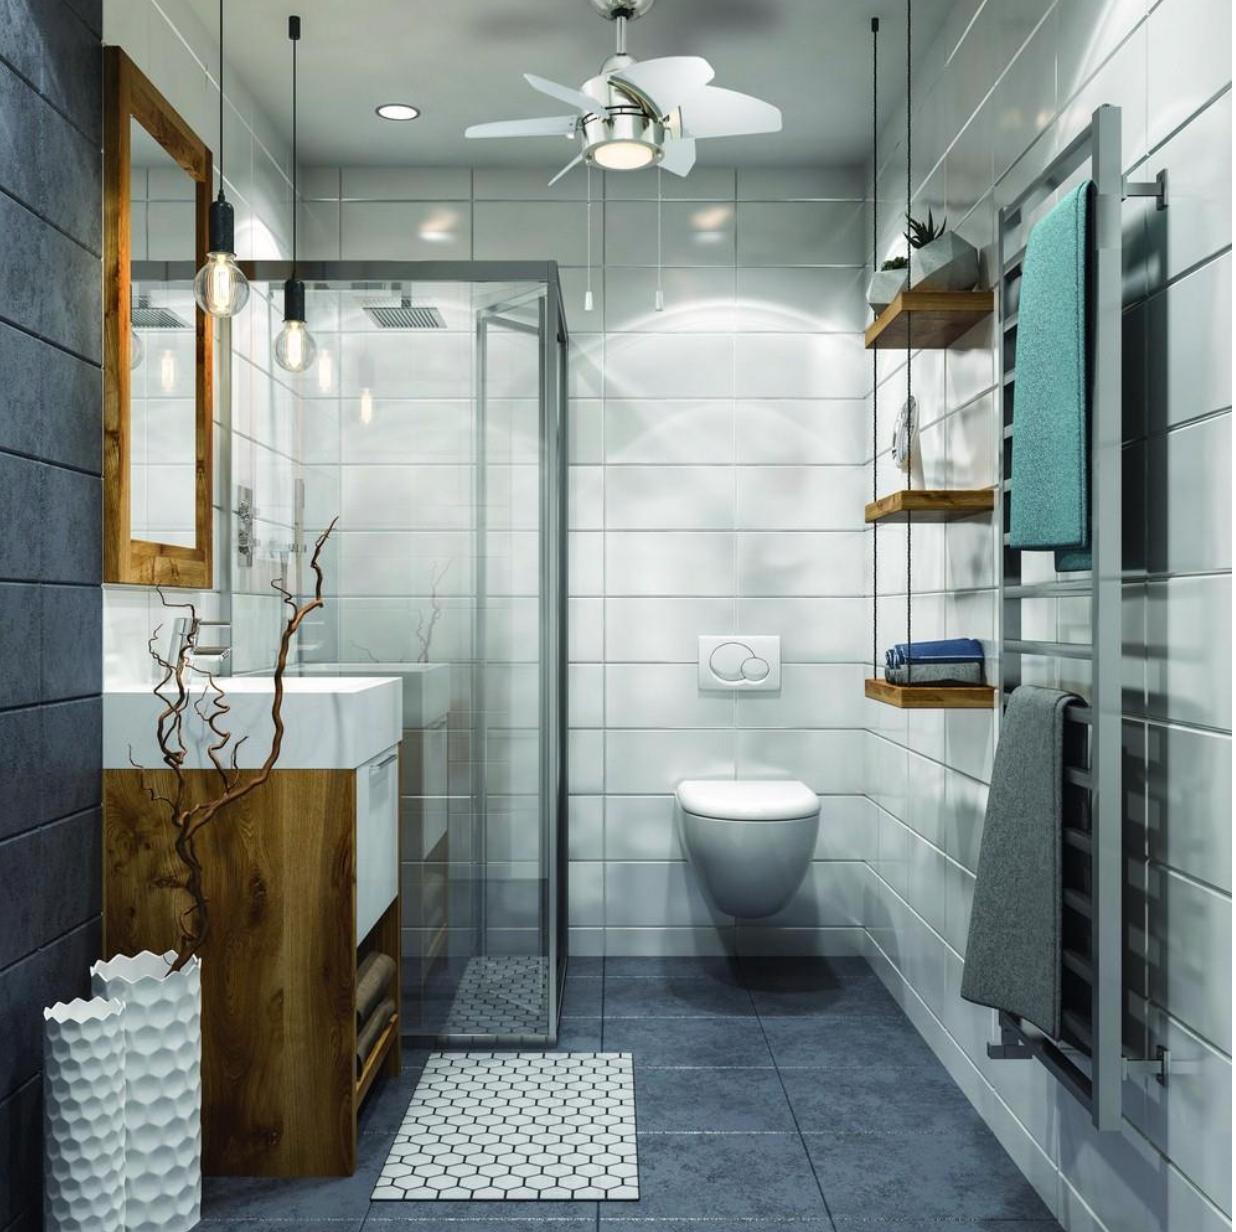 Craftmade Lighting Ppl246 Propel 24 Ceiling Fan With Light Kit Bathroom Industrial Chic Bathroom Design Small Bathroom Interior